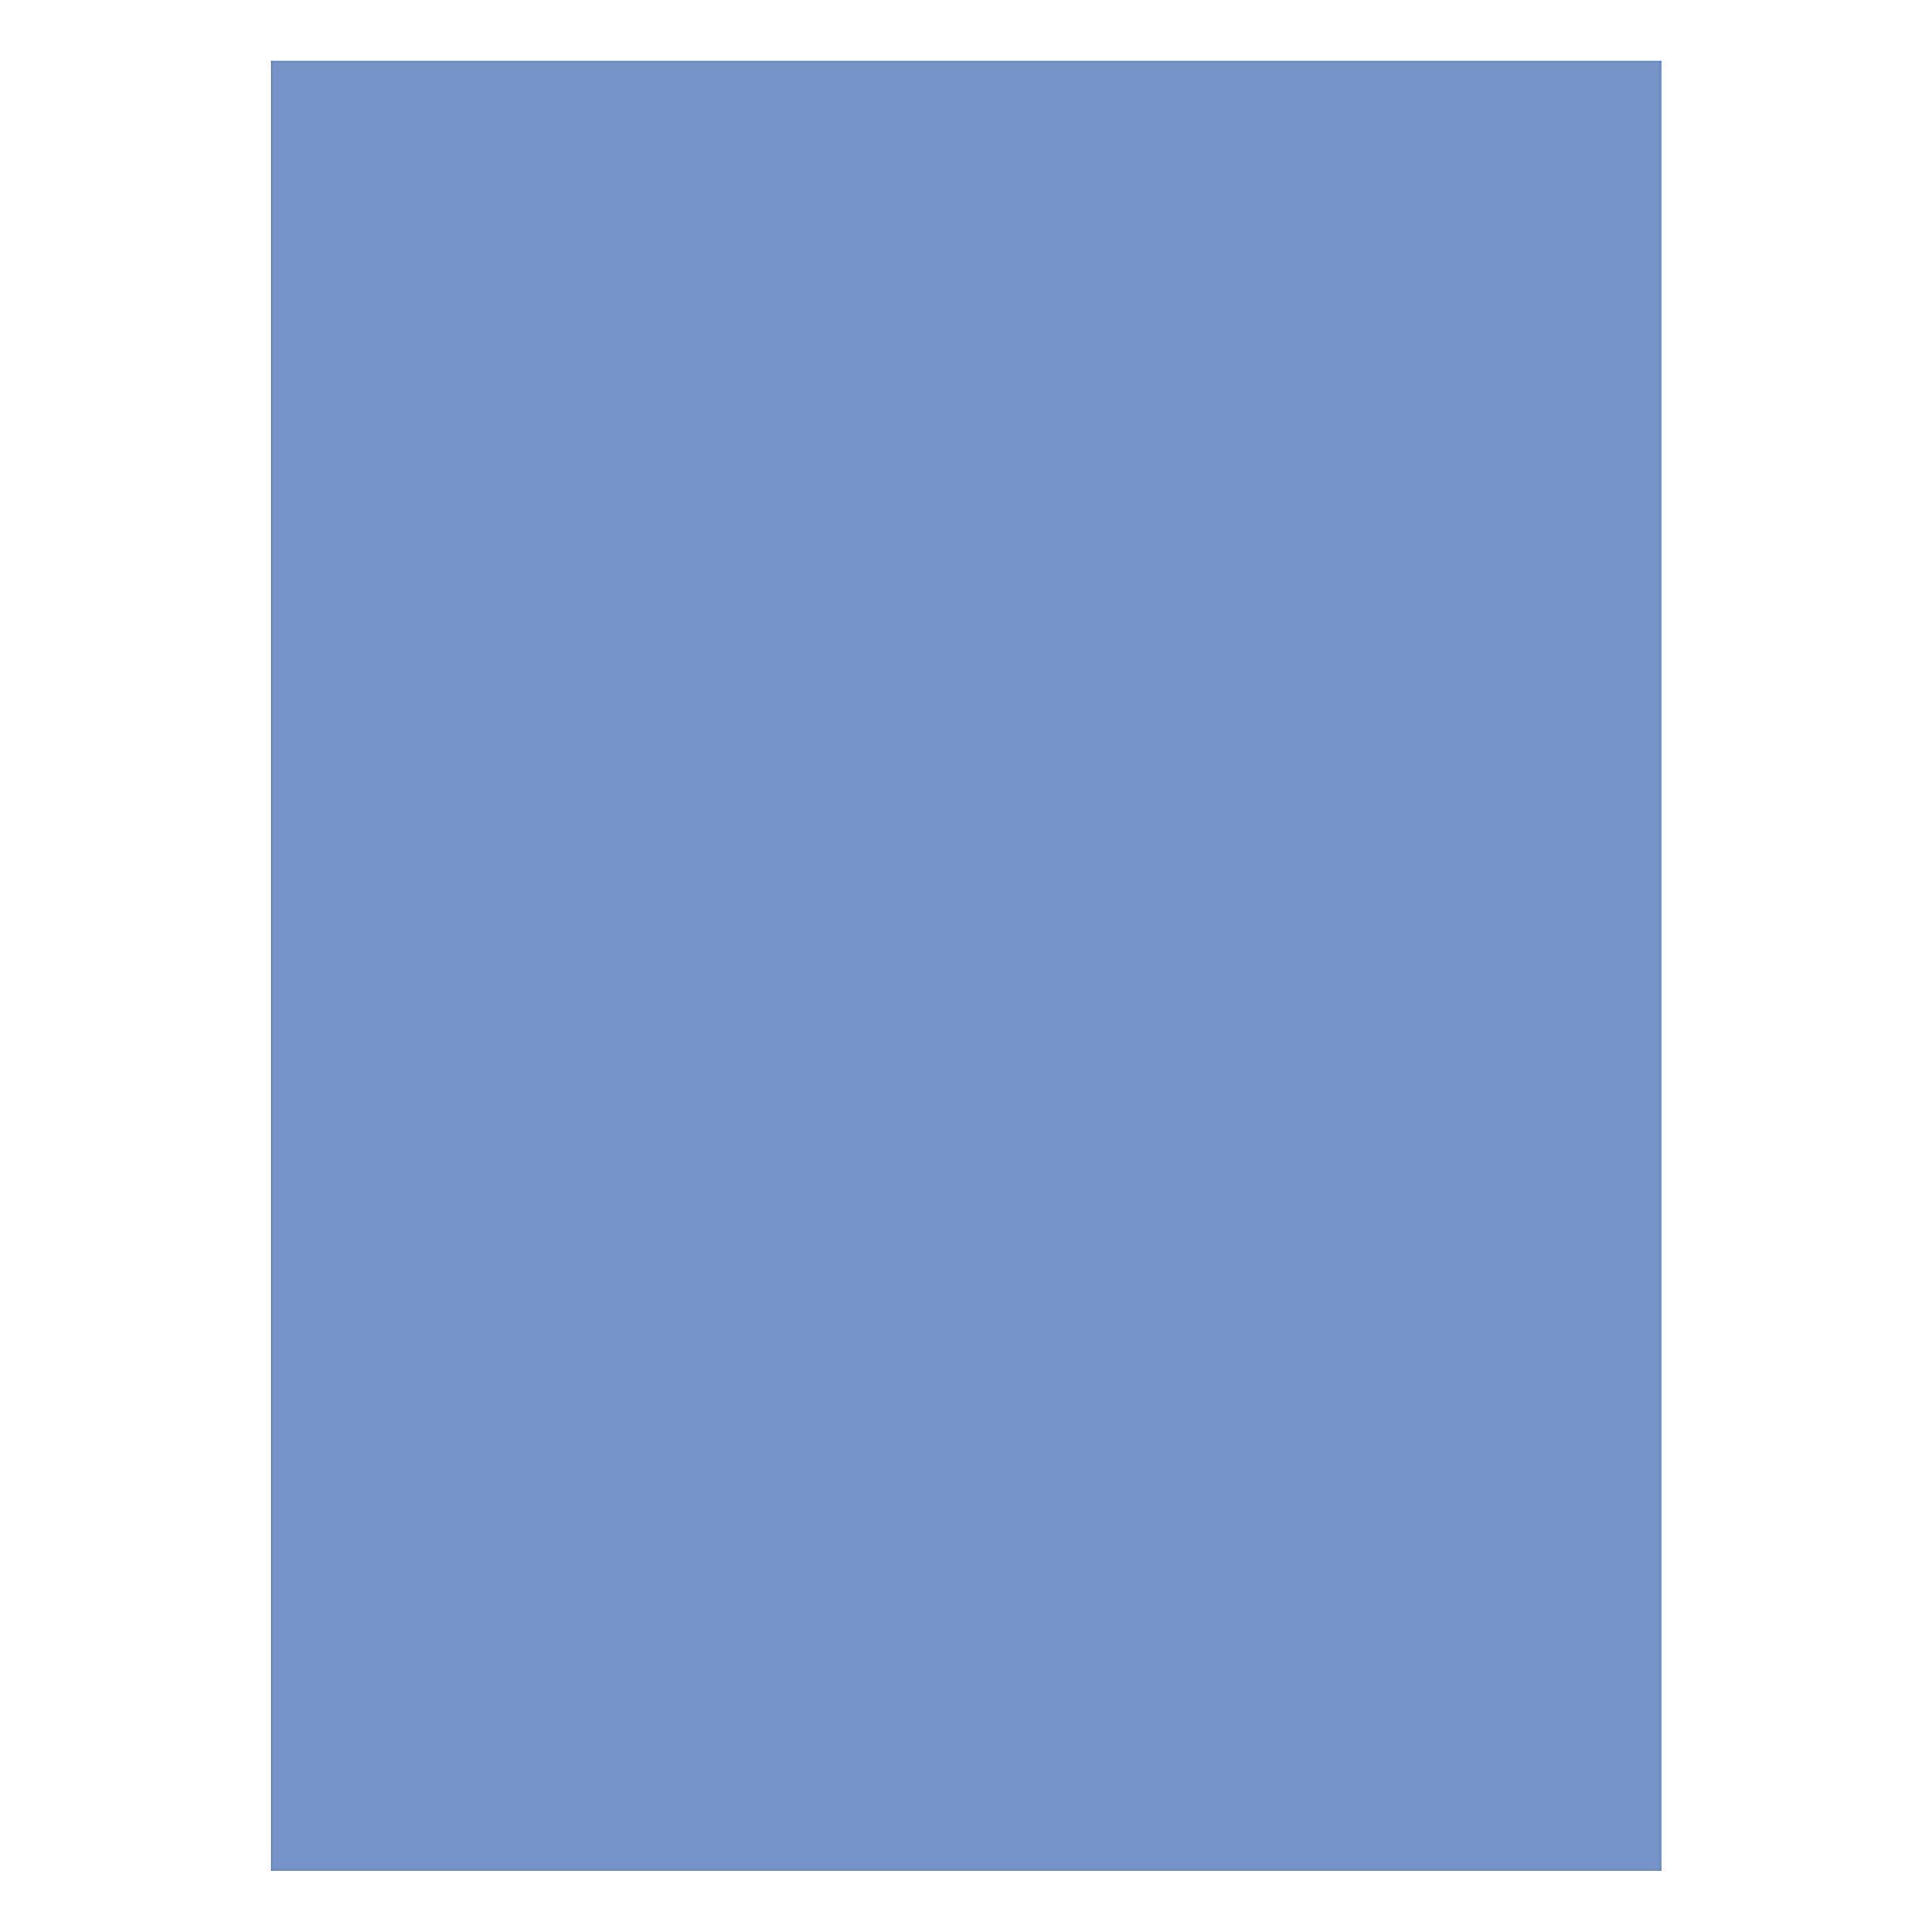 Bazzill Basics 300080 Cardstock, Serenity